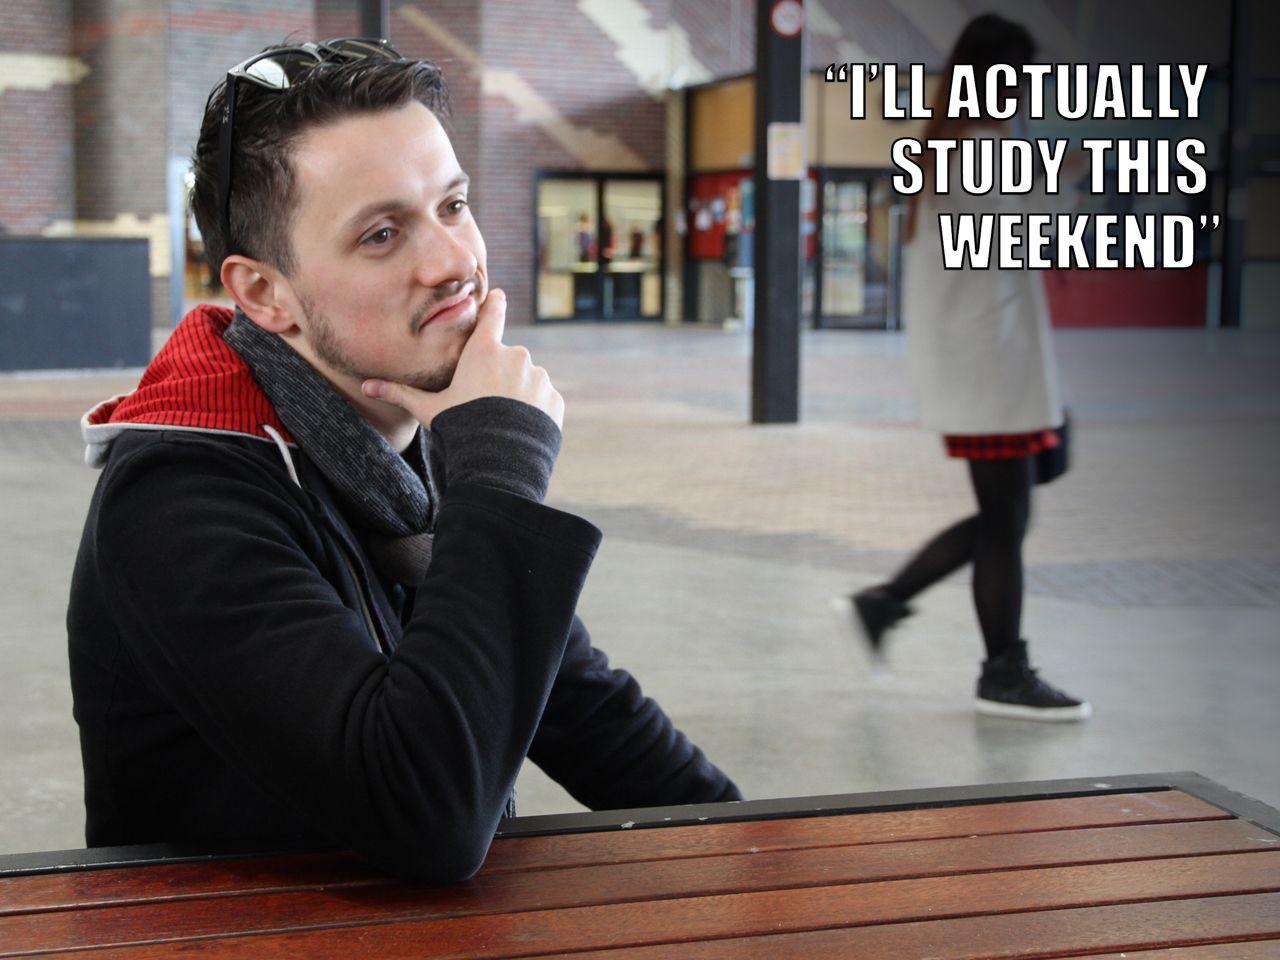 #Deakin #unilife #university #tech #Melbourne #Victoria #Australia #student #studying #meme #exams